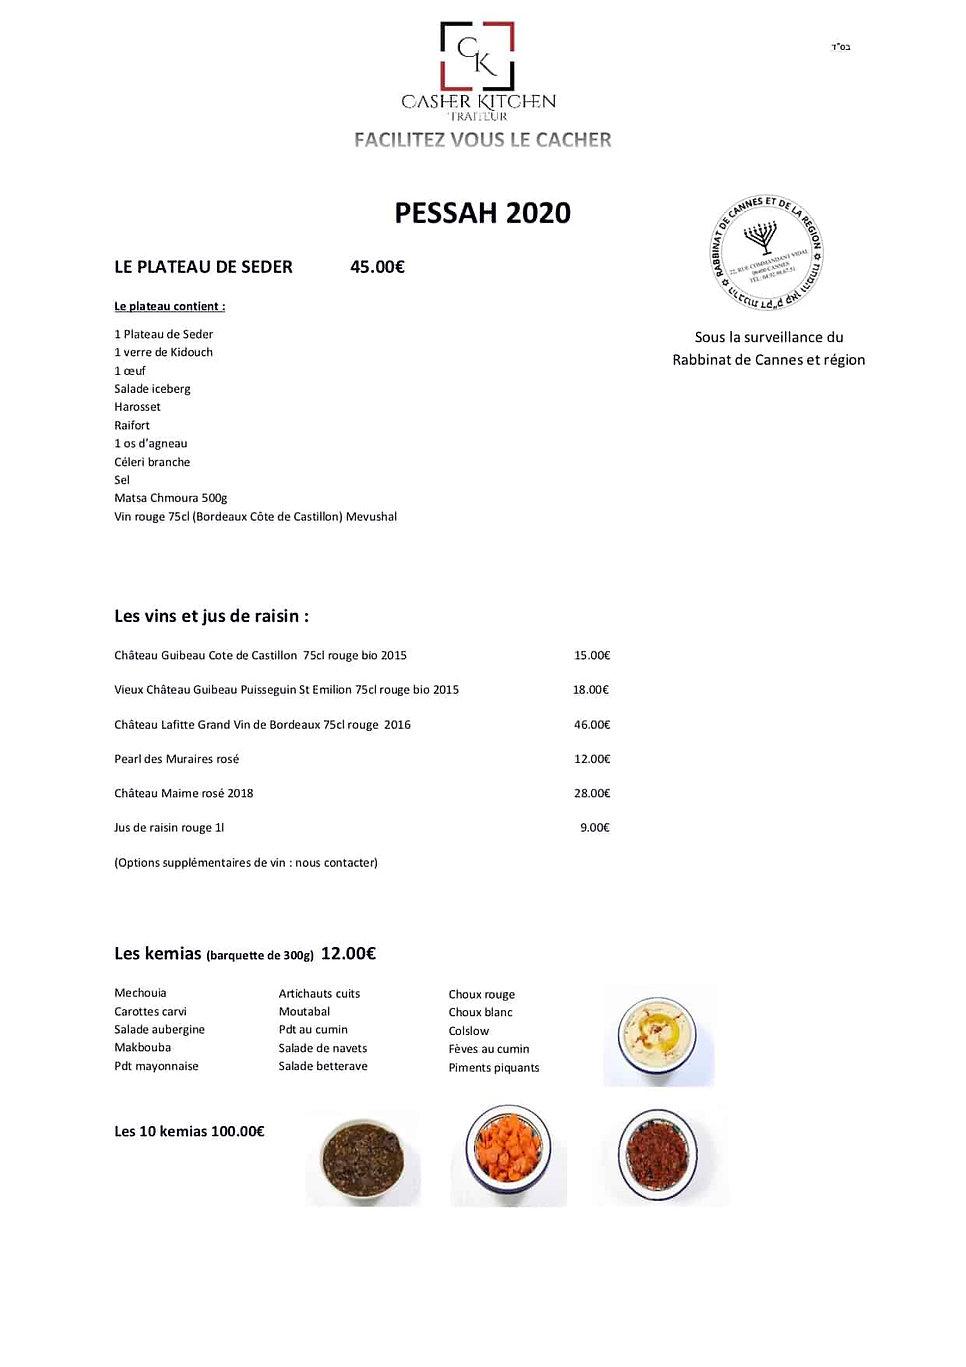 Menu Pessah 2020.jpg